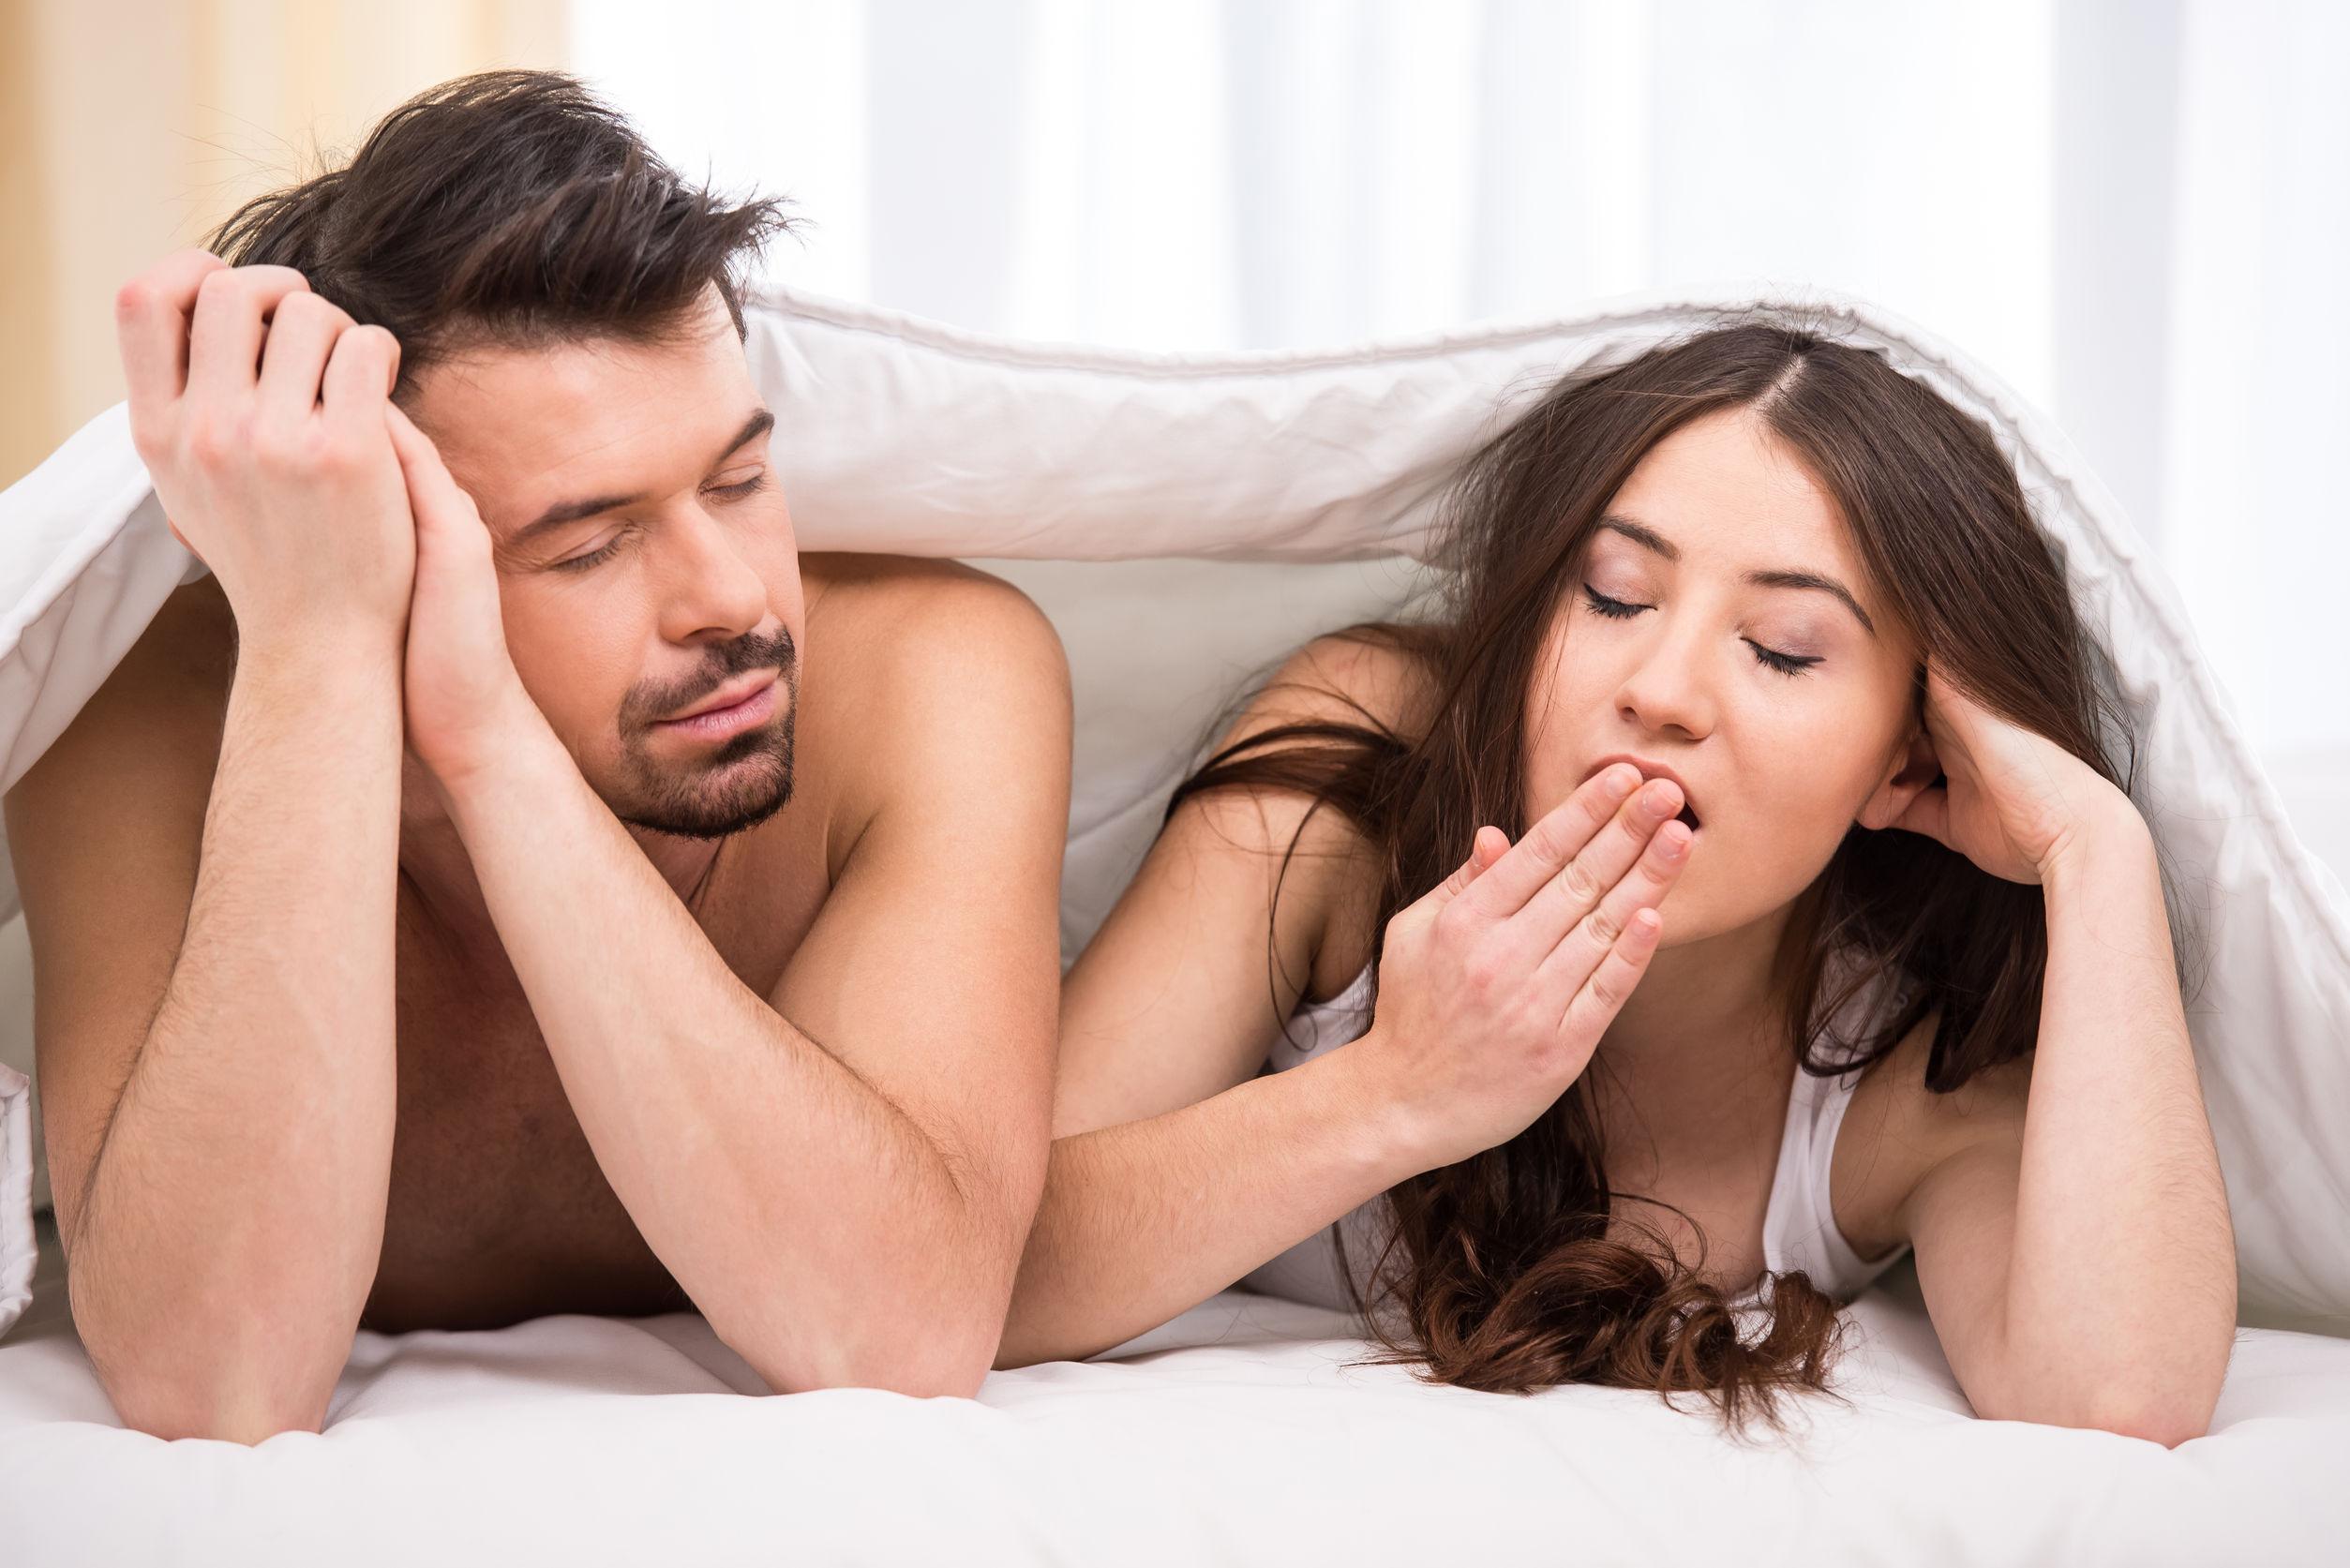 Онлайн неожиданный секс для девушки